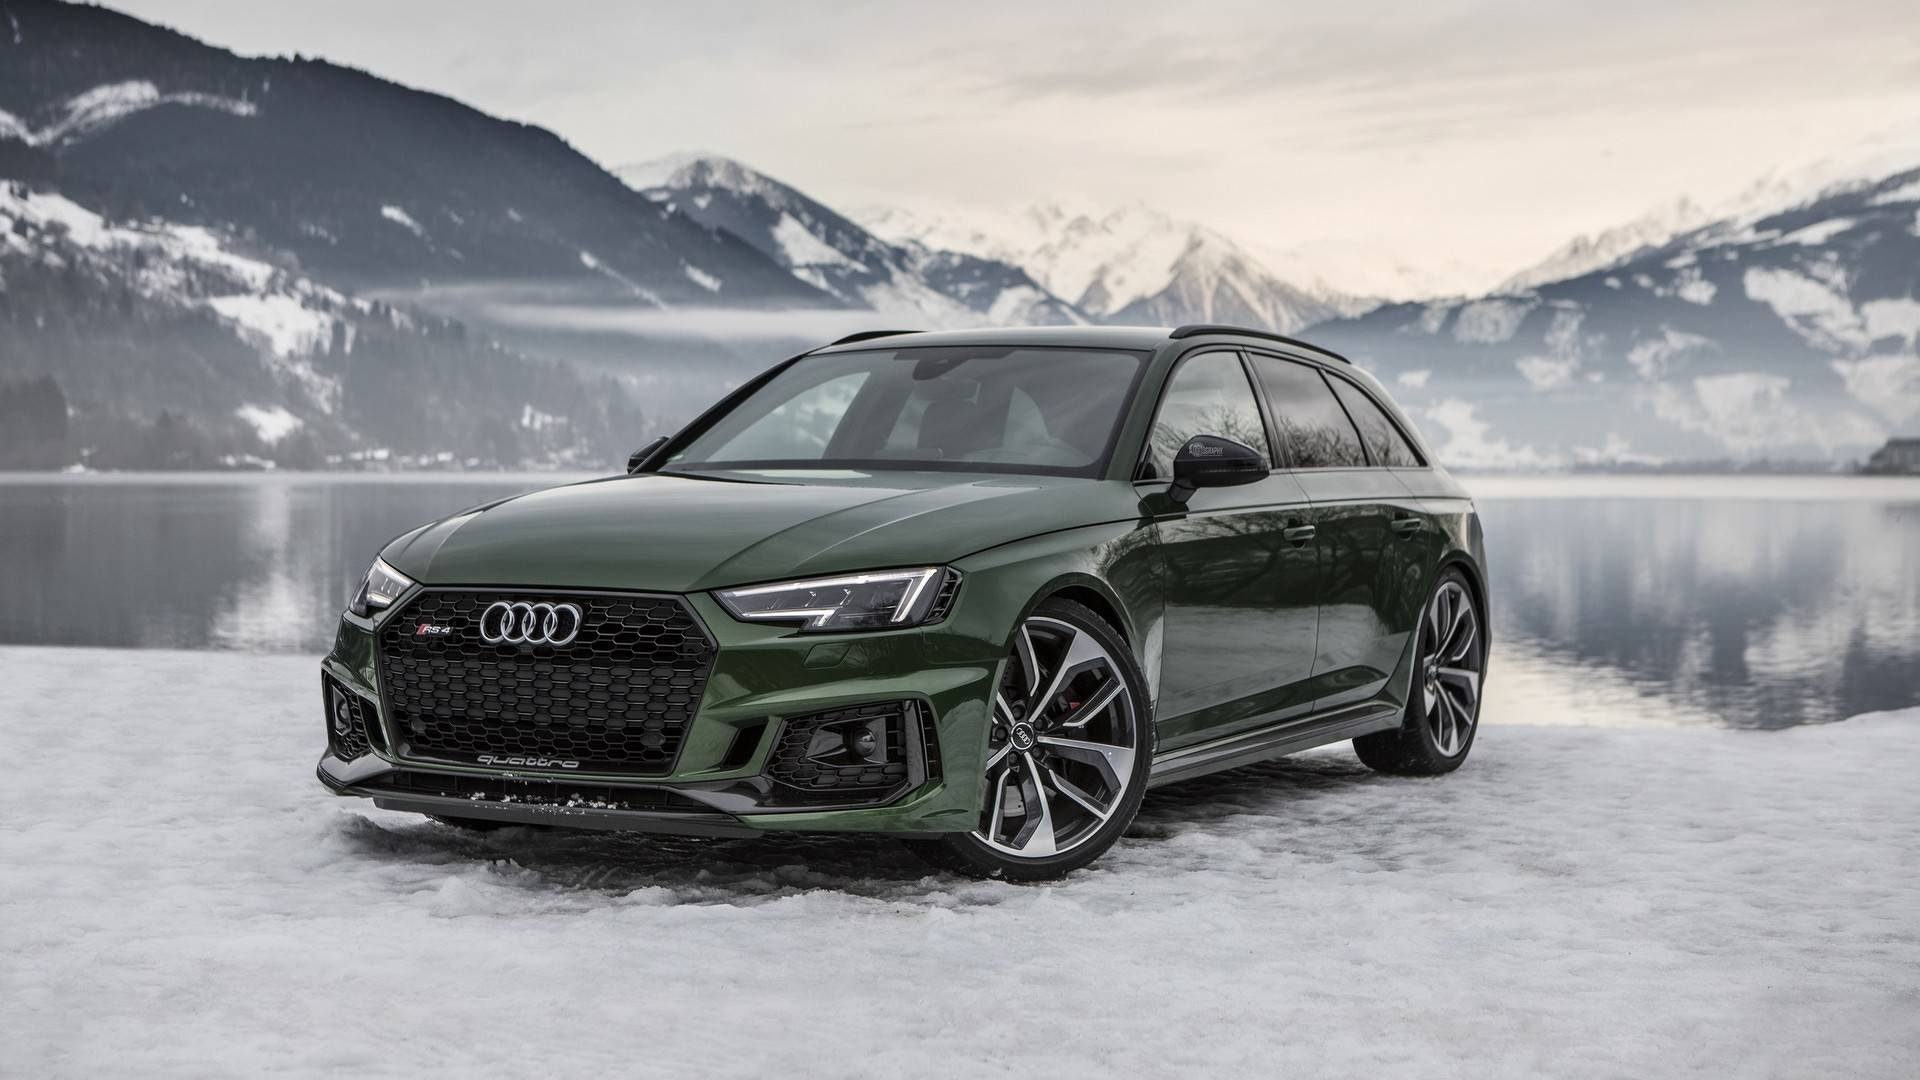 Audi RS4 Avant Flaunts Sonoma Green Paint In A Winter Wonderland